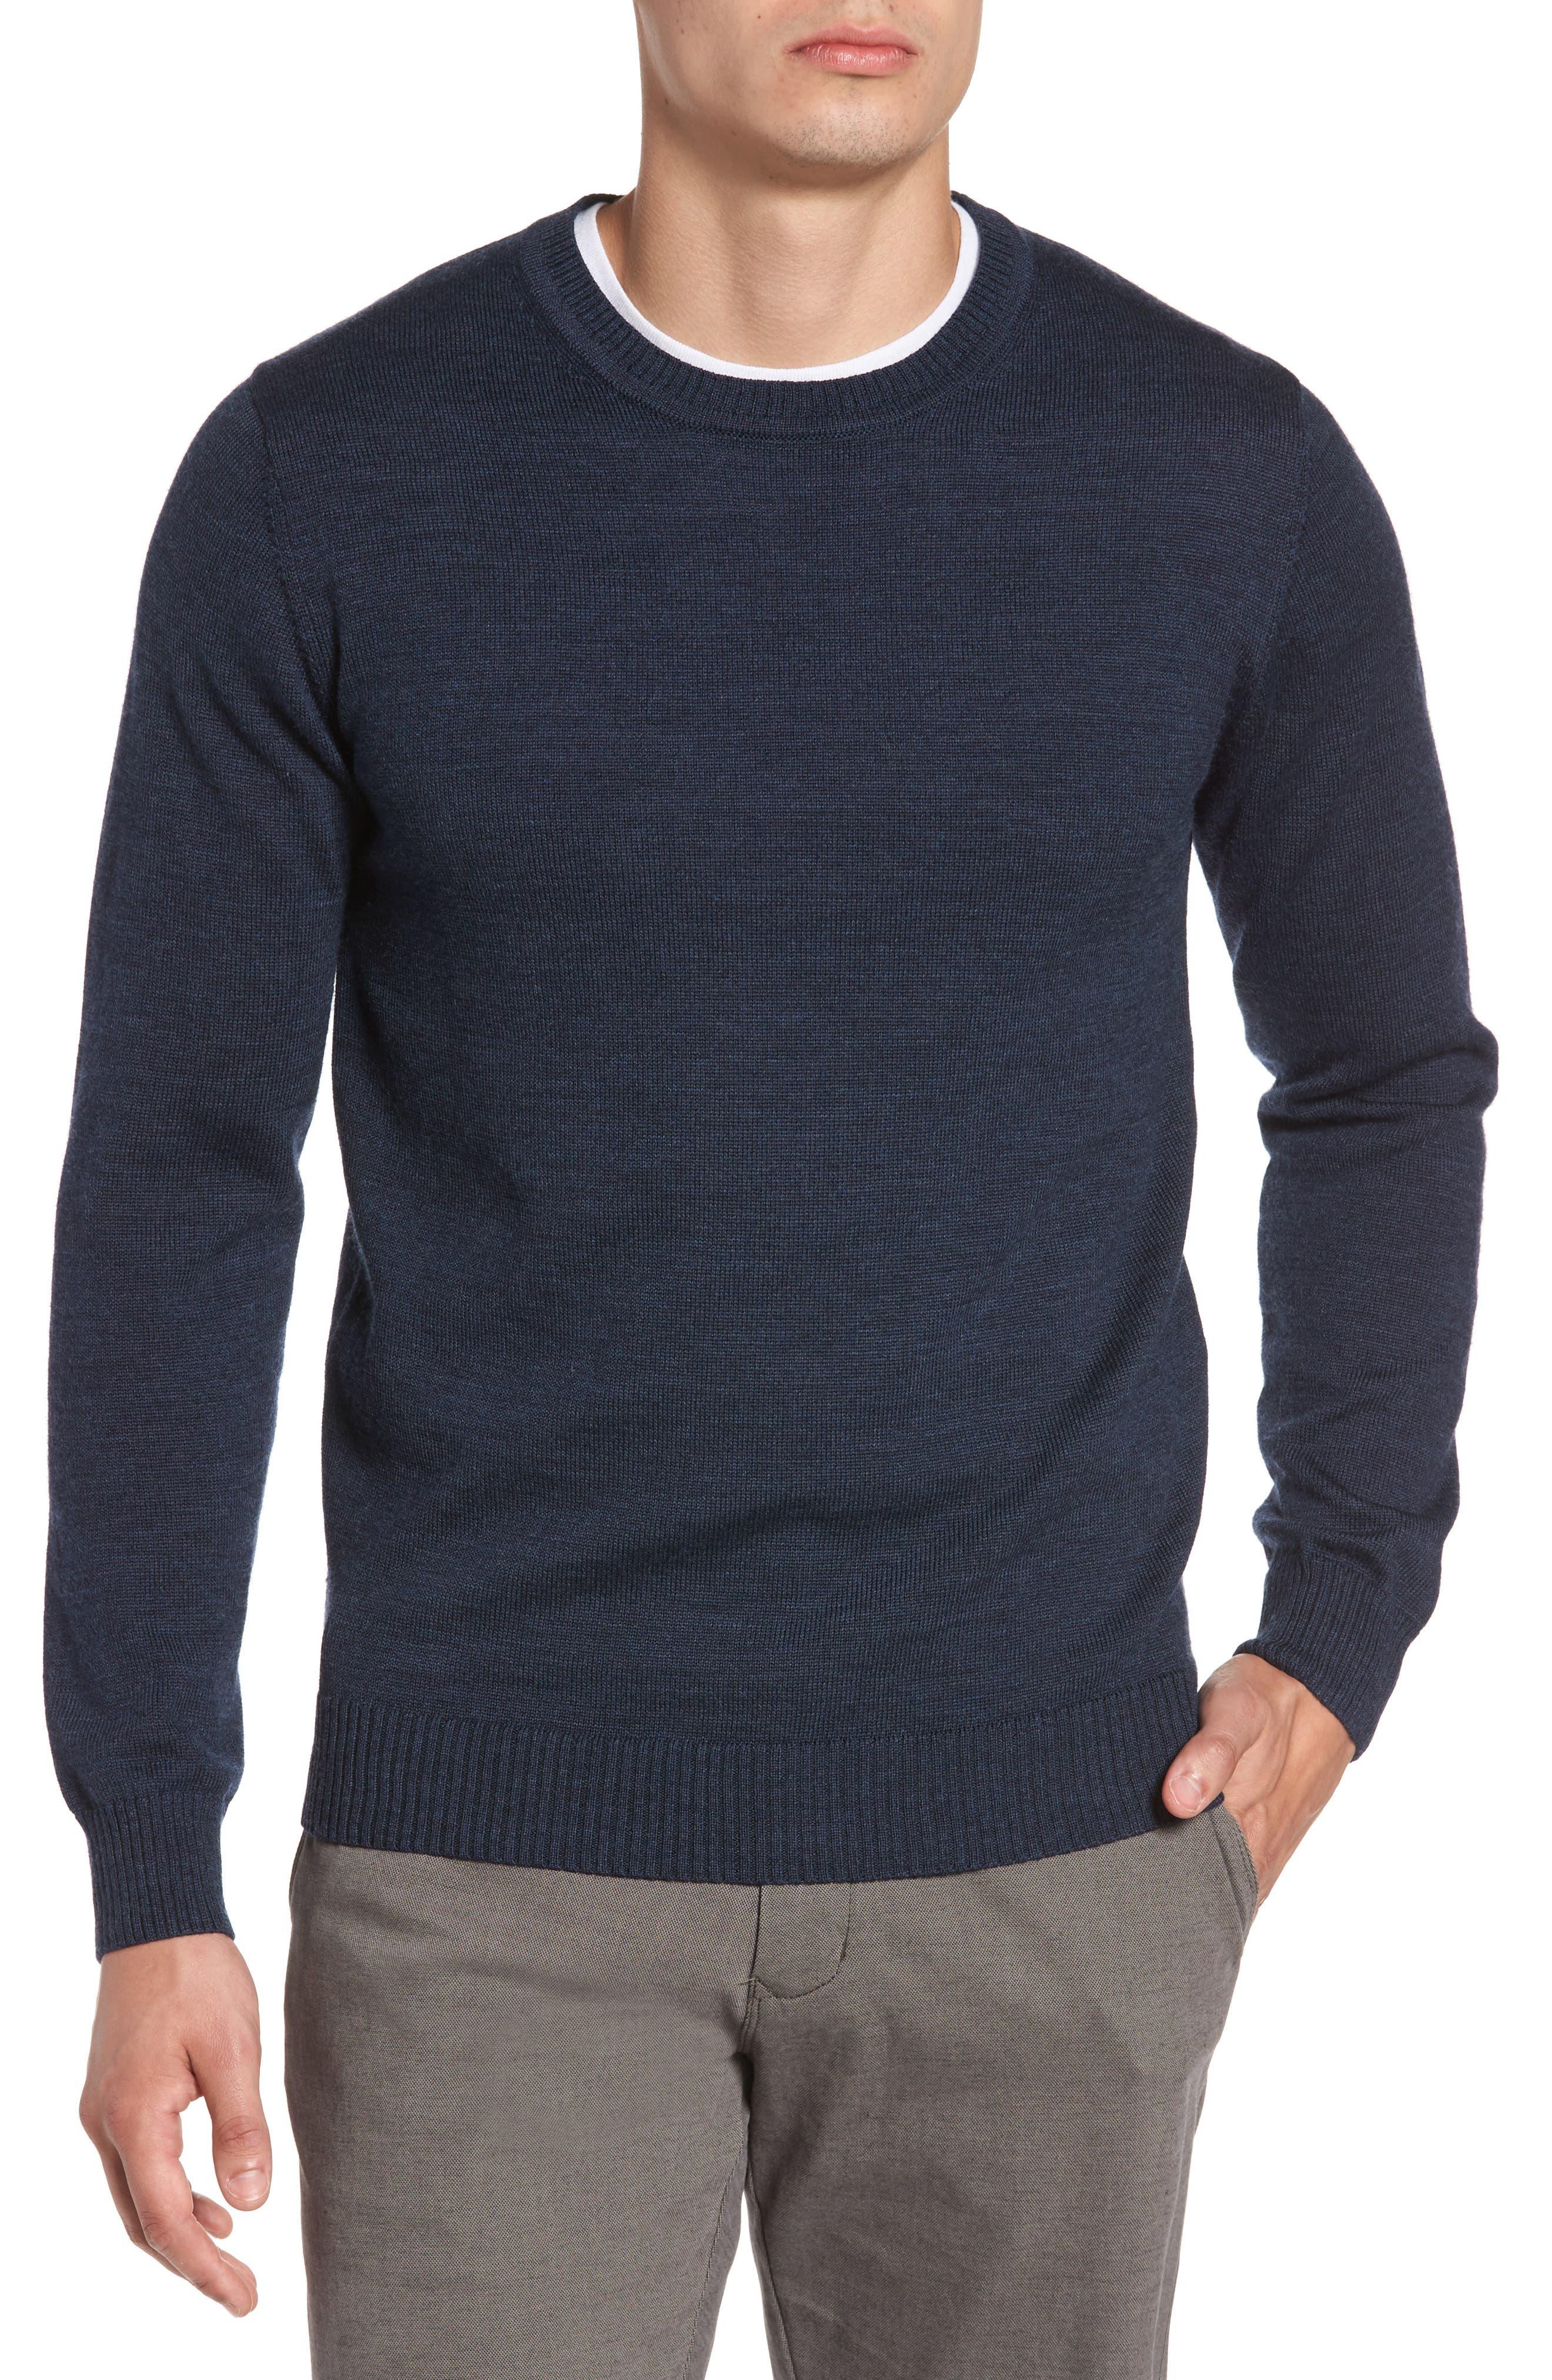 Bannockburn Mélange Merino Wool Sweater,                             Main thumbnail 1, color,                             401